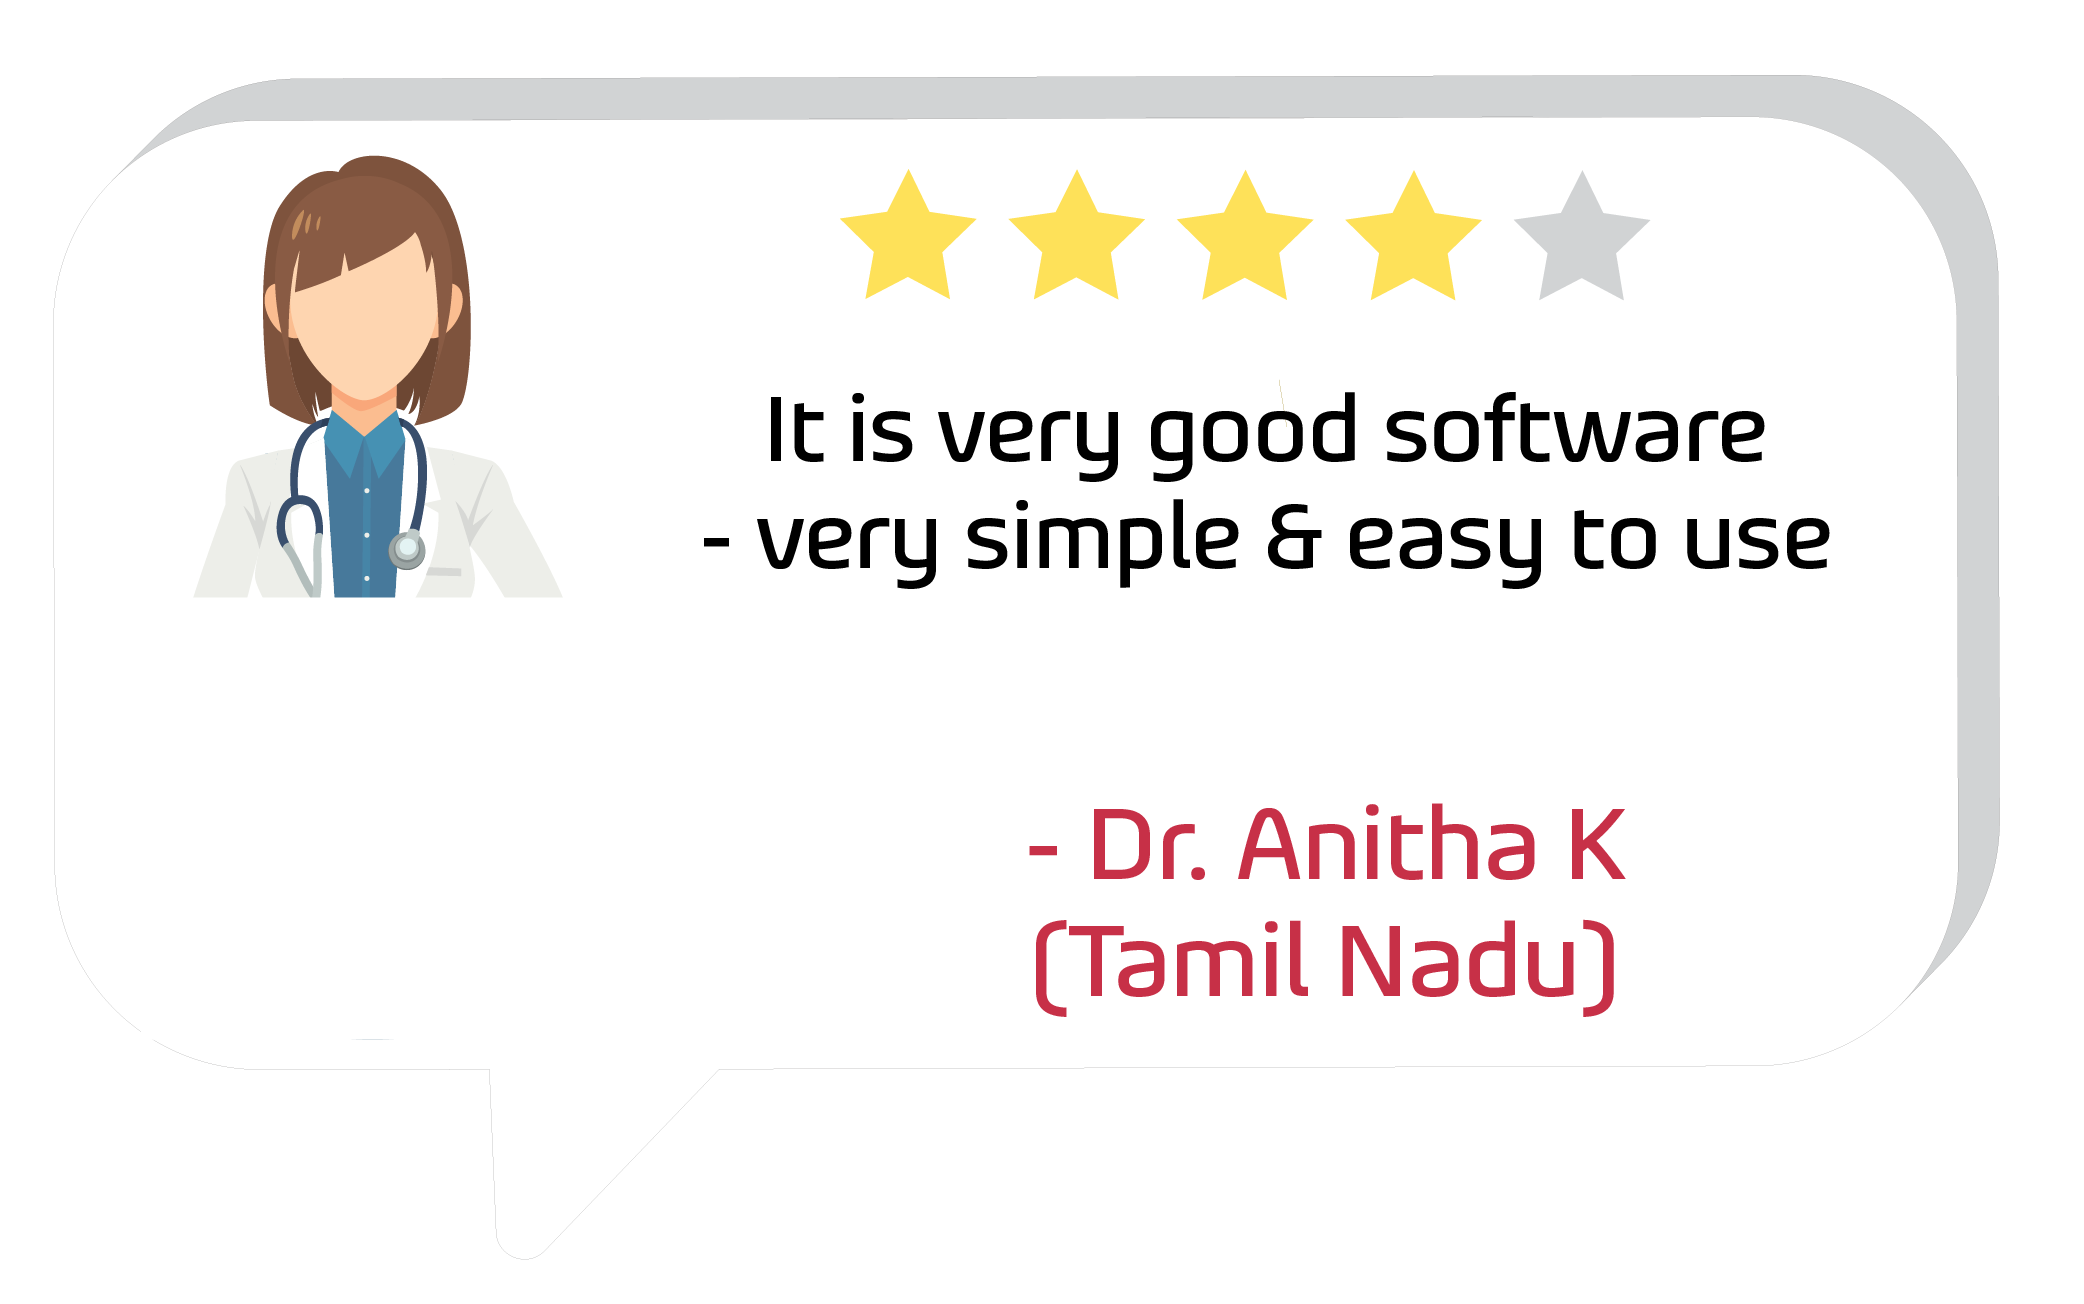 Dr. Anitha